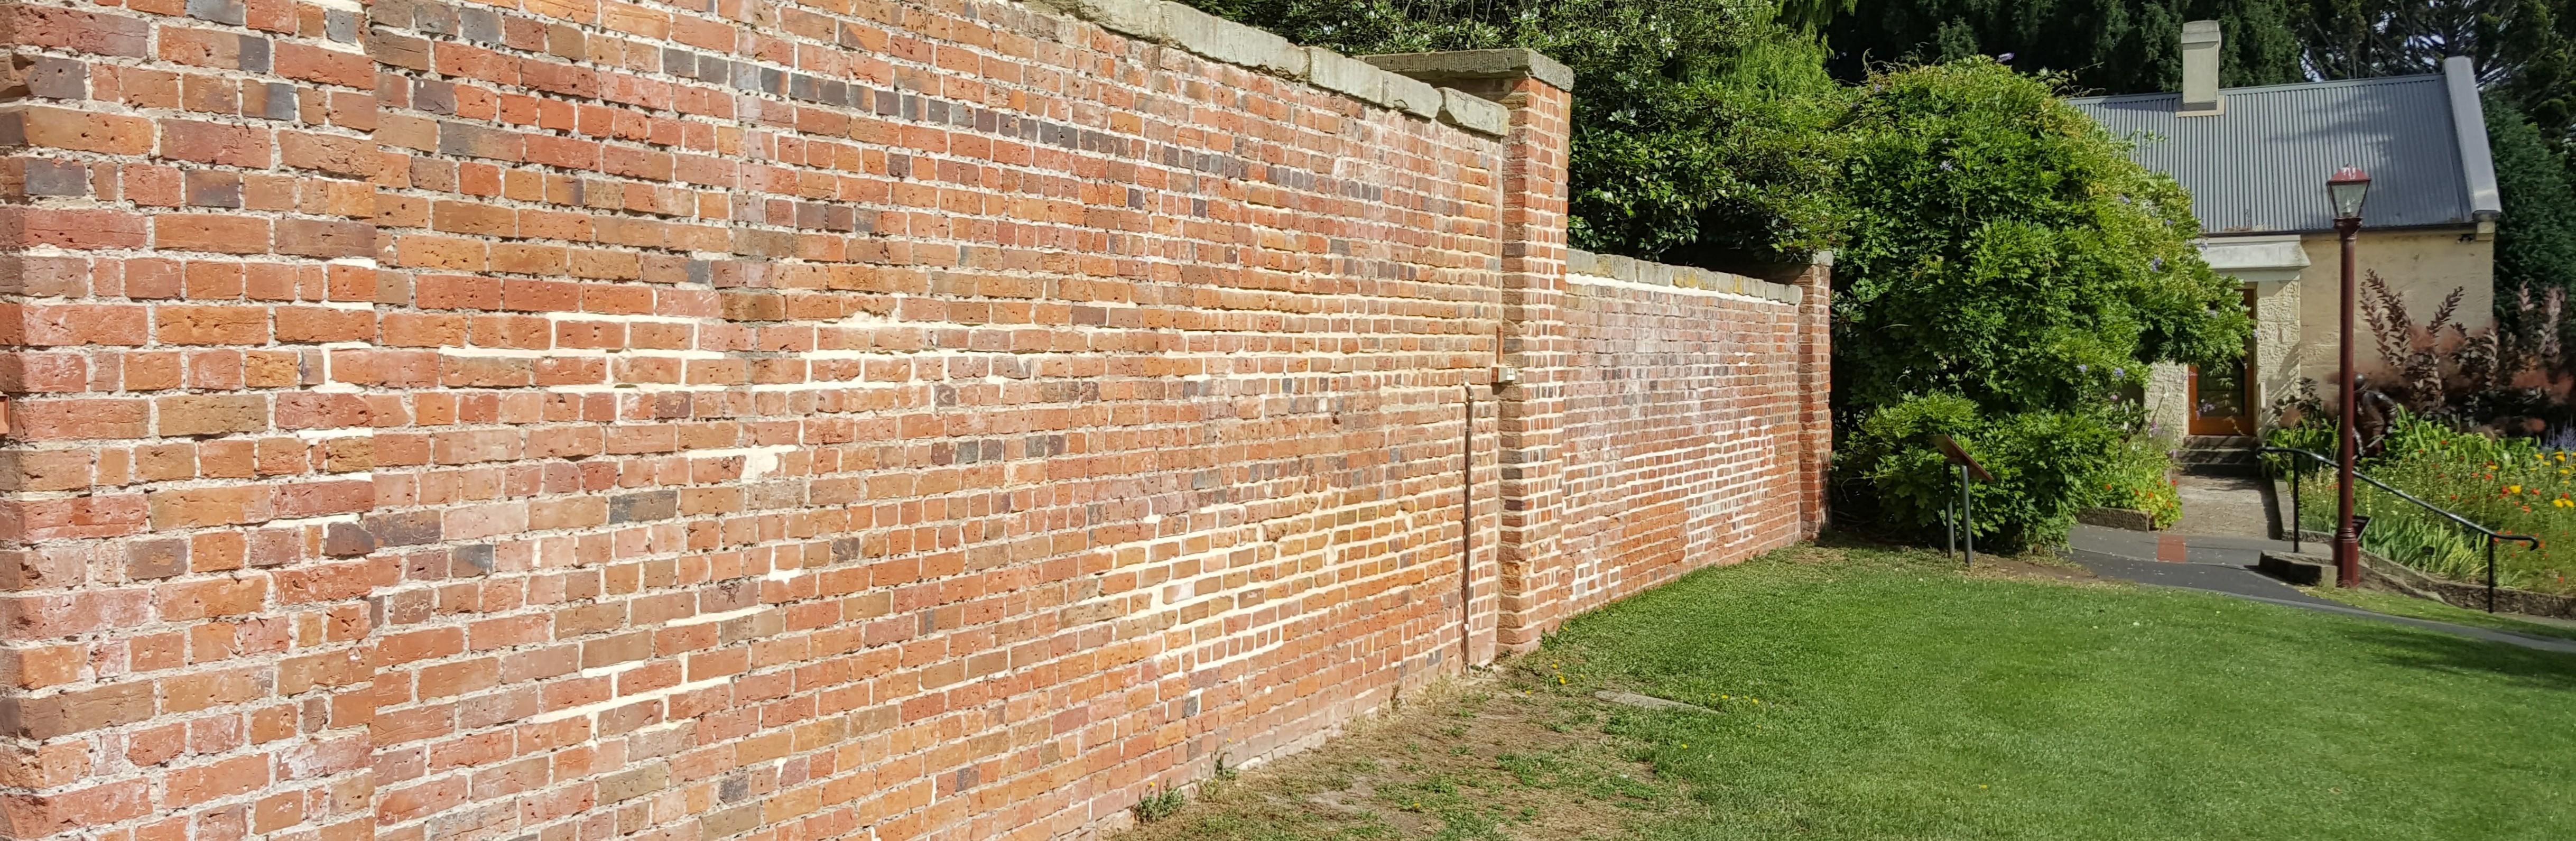 Arthur-wall